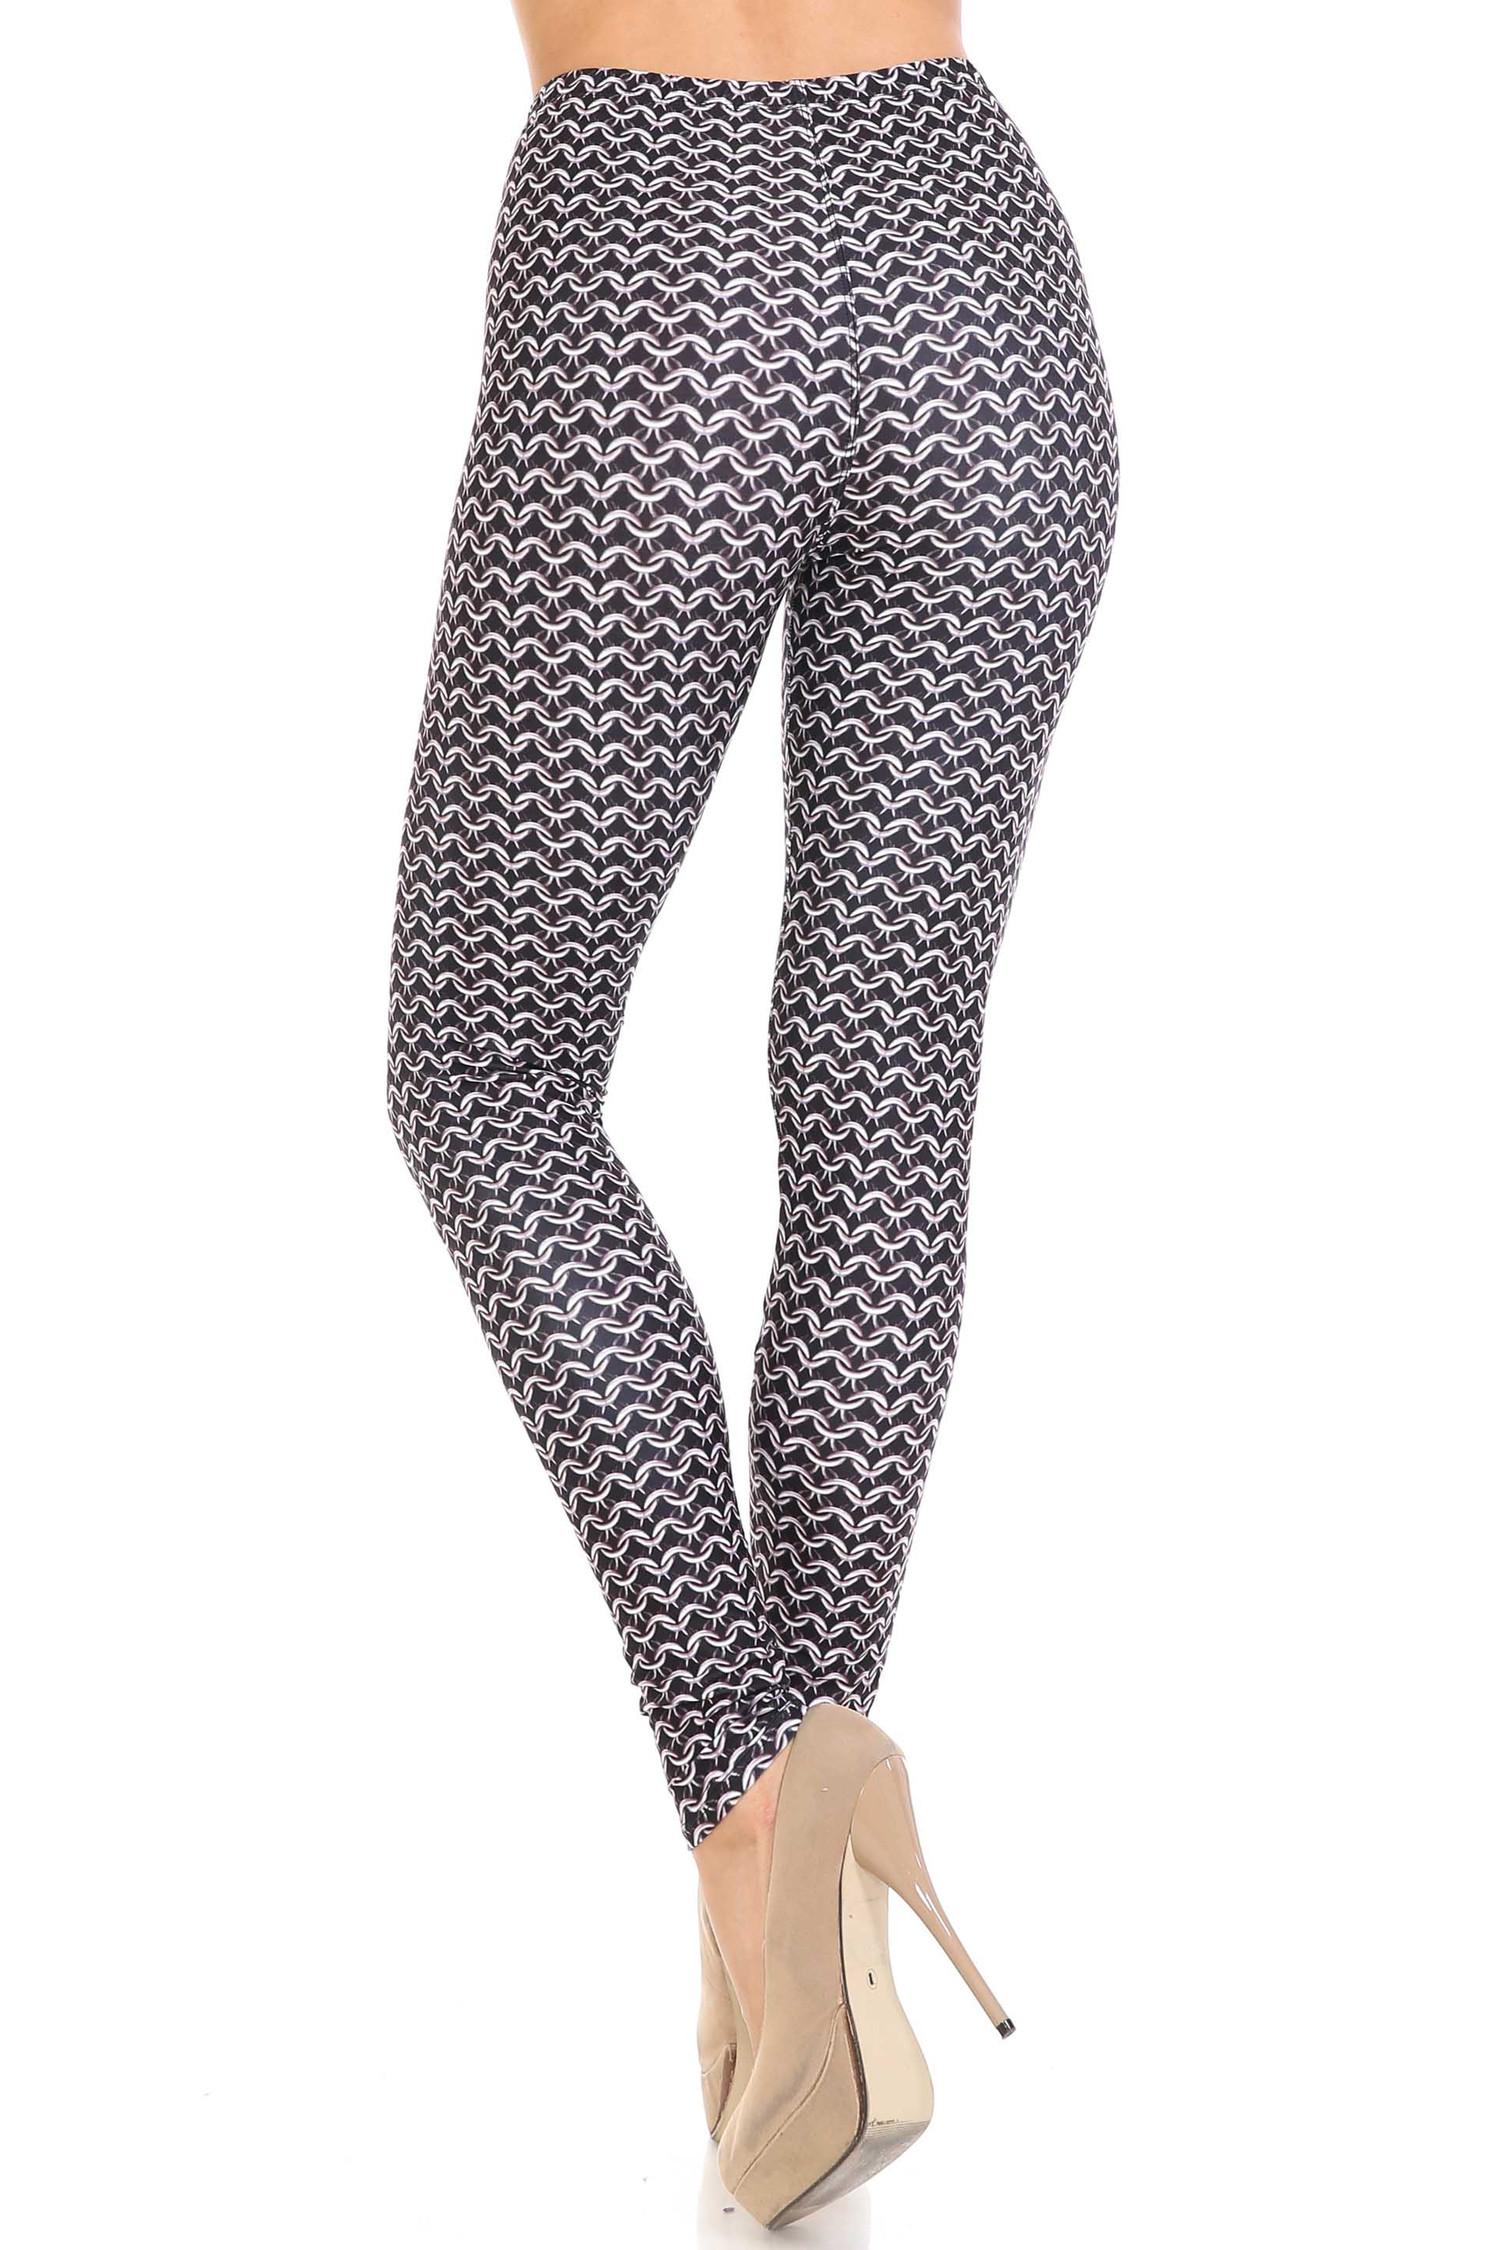 Creamy Soft Chainmail Plus Size Leggings - USA Fashion™